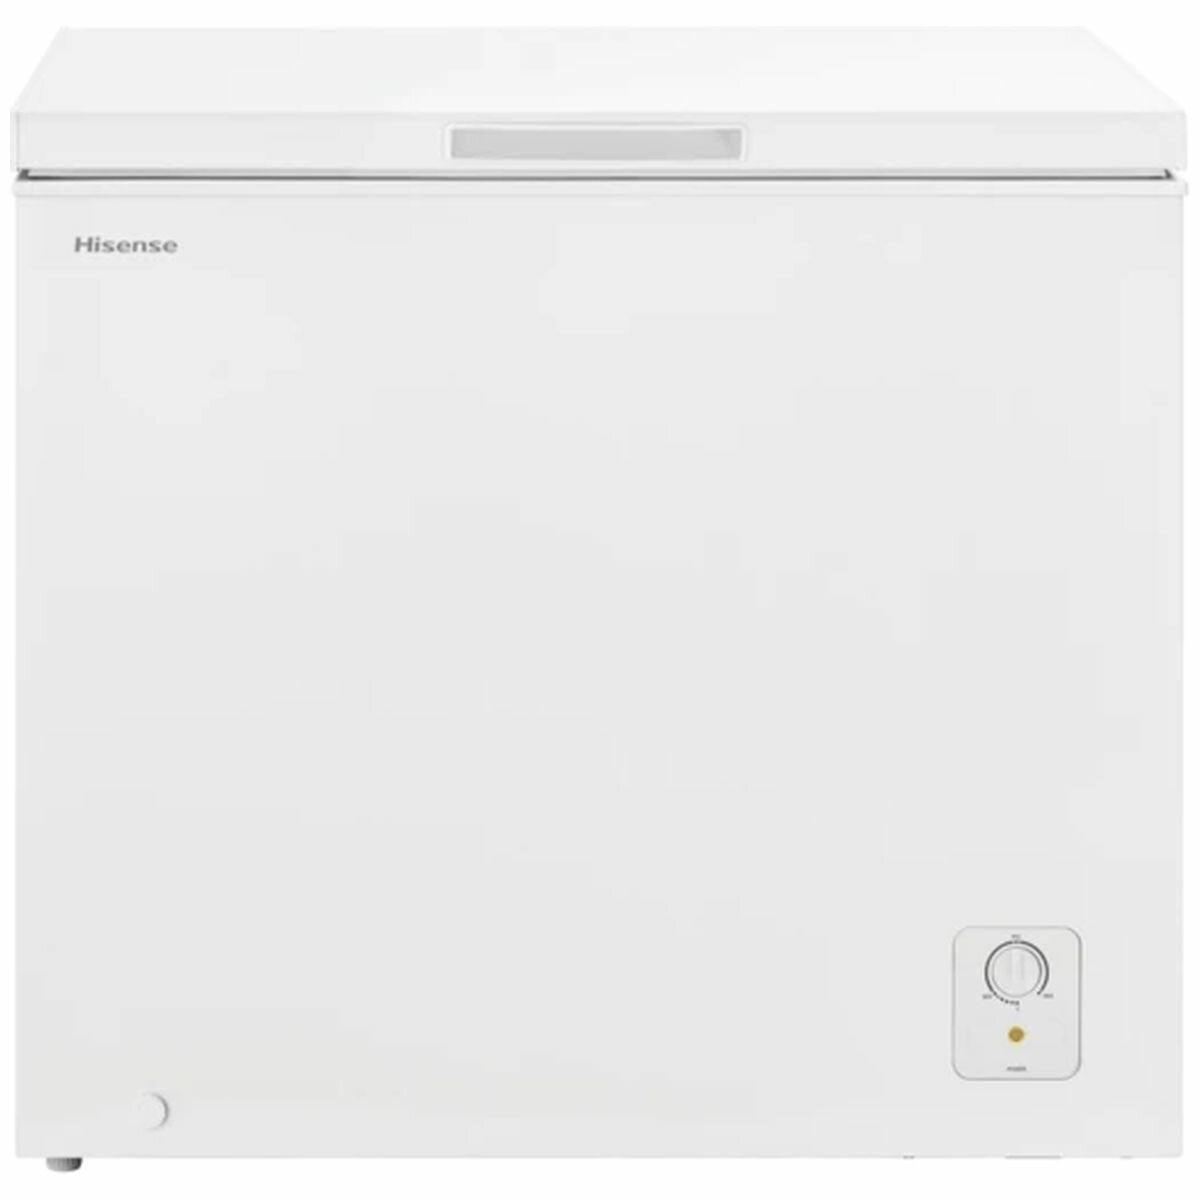 Hisense HR6CF200 Freezer